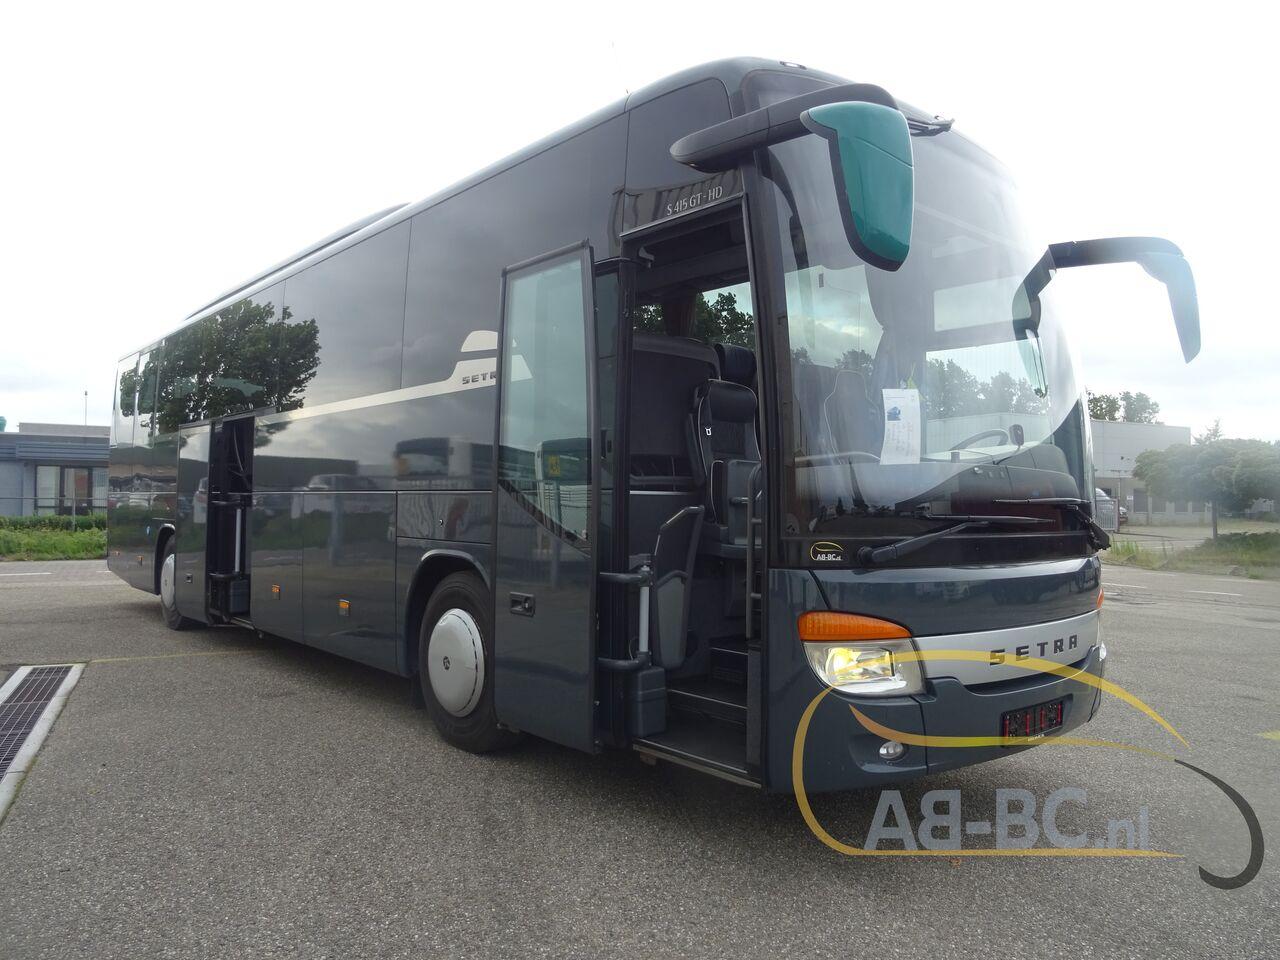 coach-busSETRA-S415-GT-HD-FINAL-EDITION---1627456933267008626_big_a69568482e857b3f528f62a1301e5071--21050713010665719300